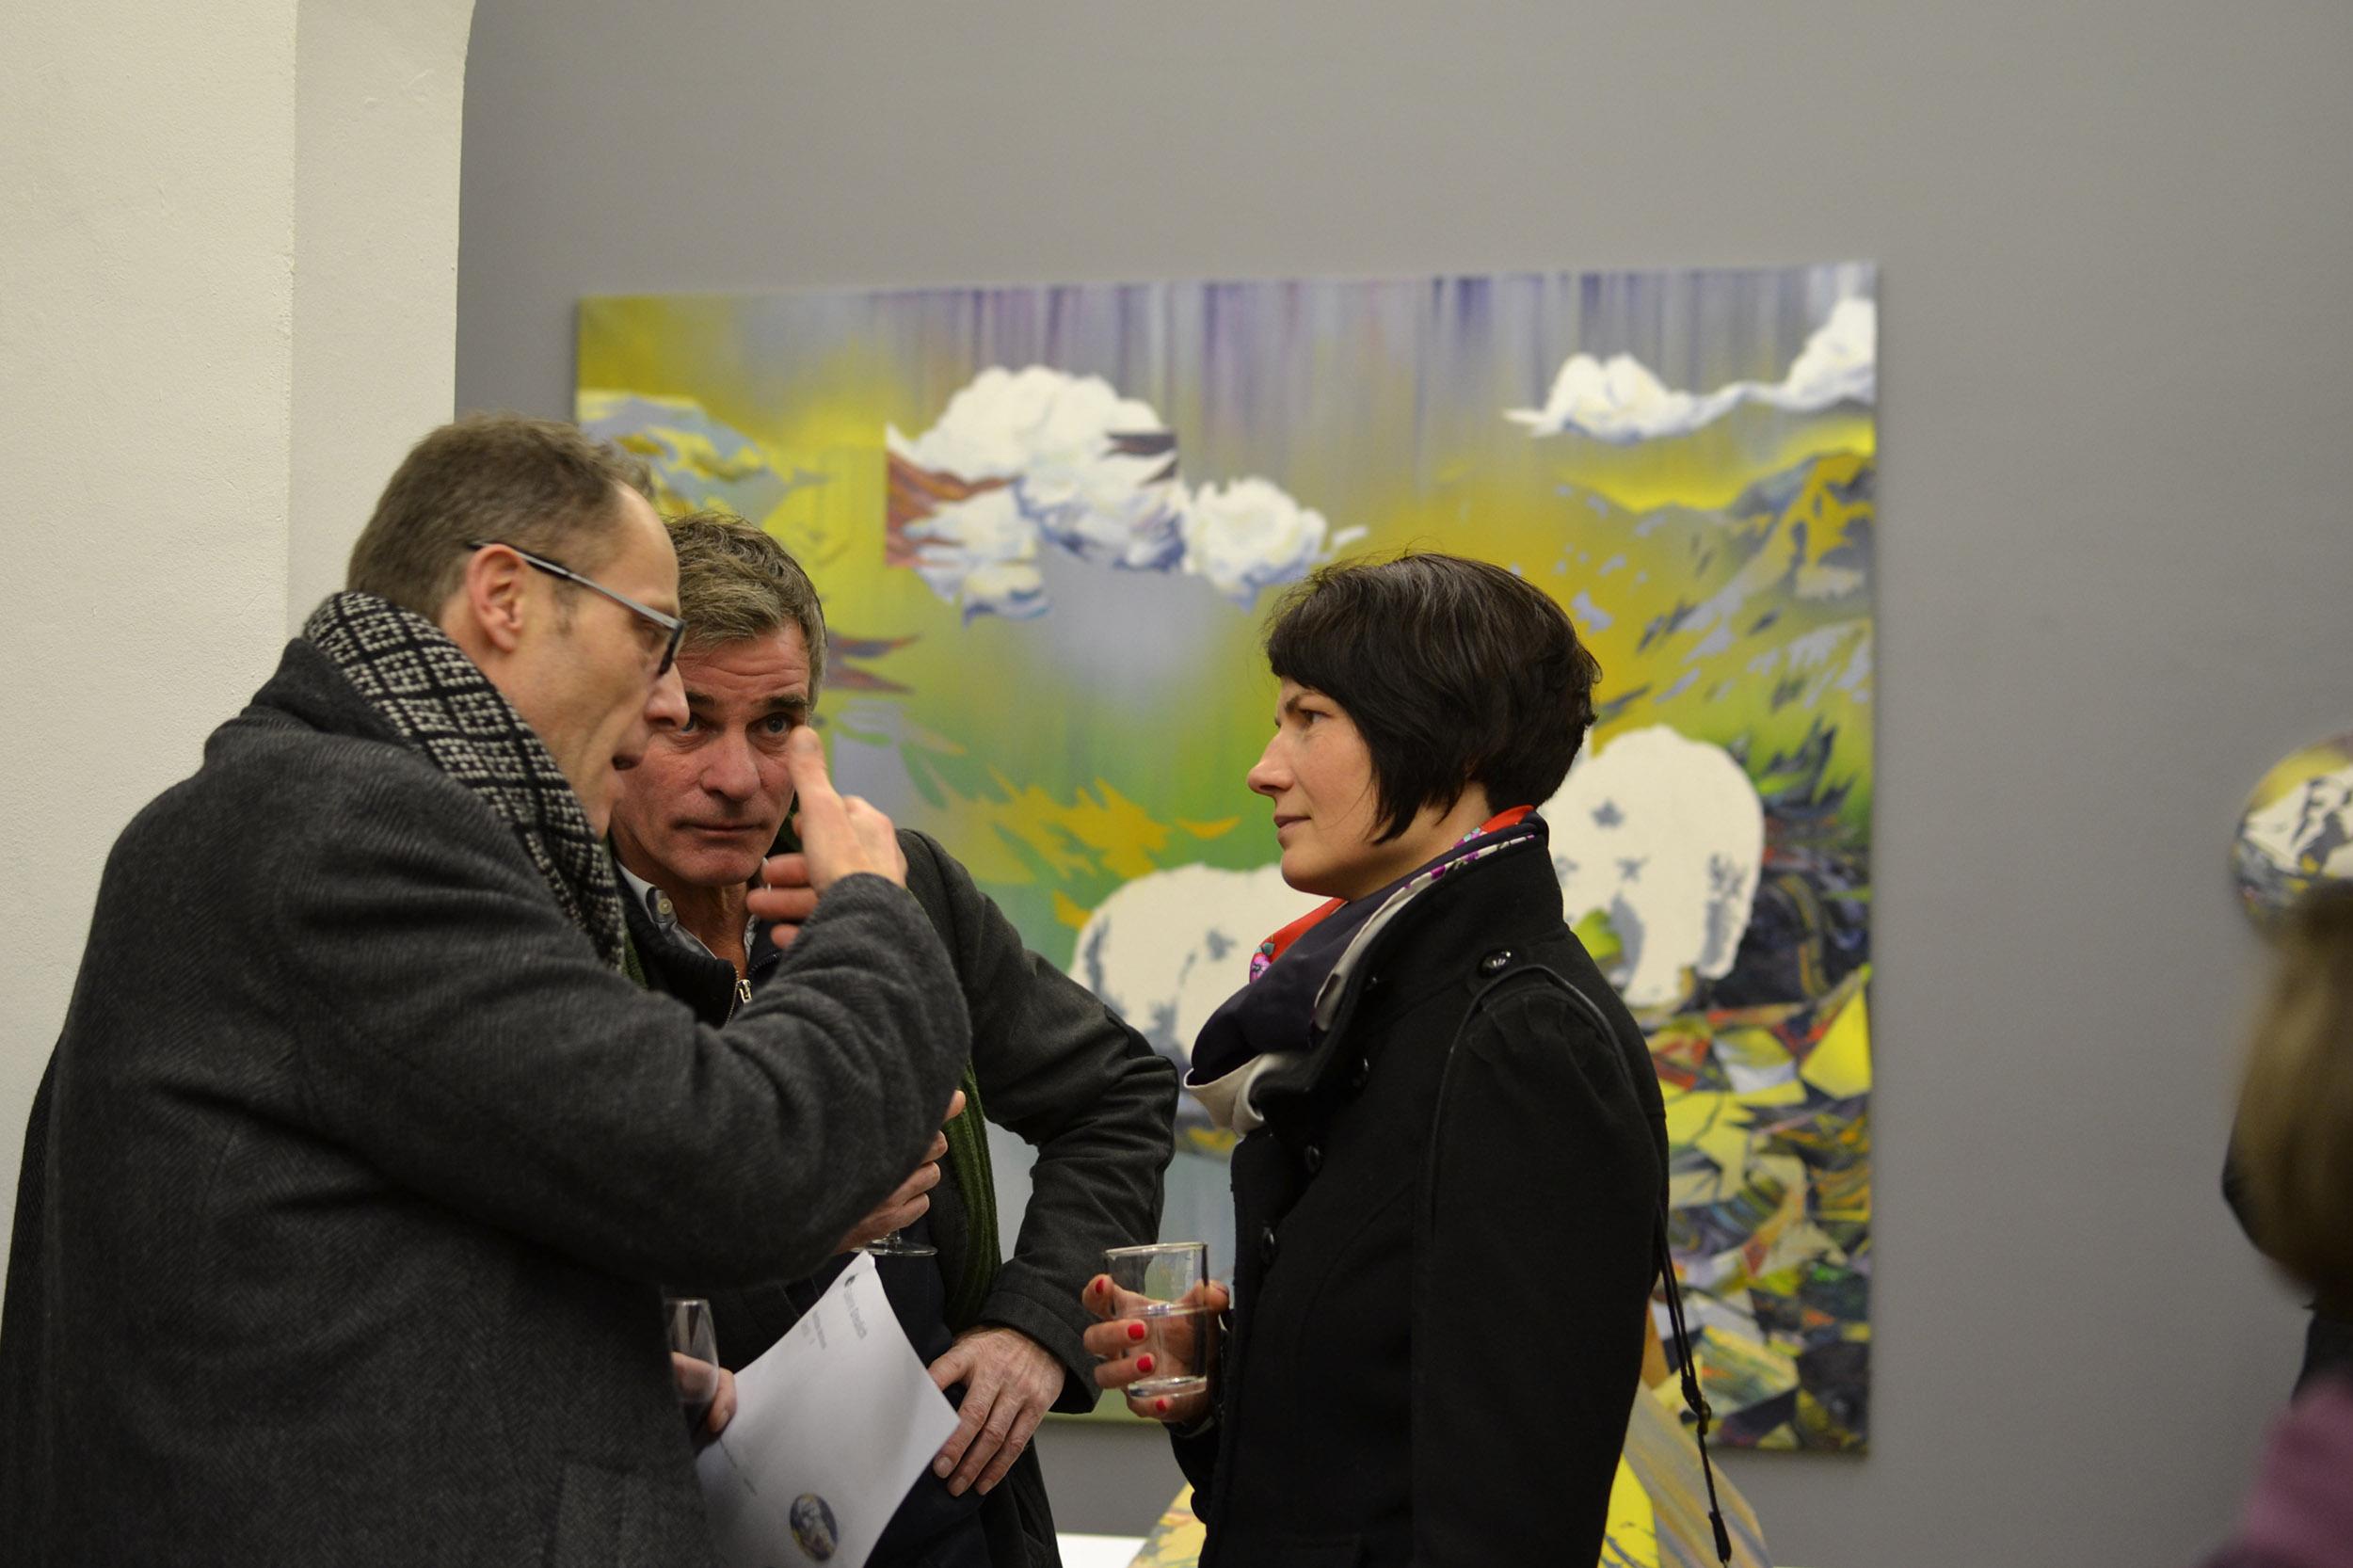 Matthias Moravek, %22Geroell%22, exhibition view7, 2014.jpg